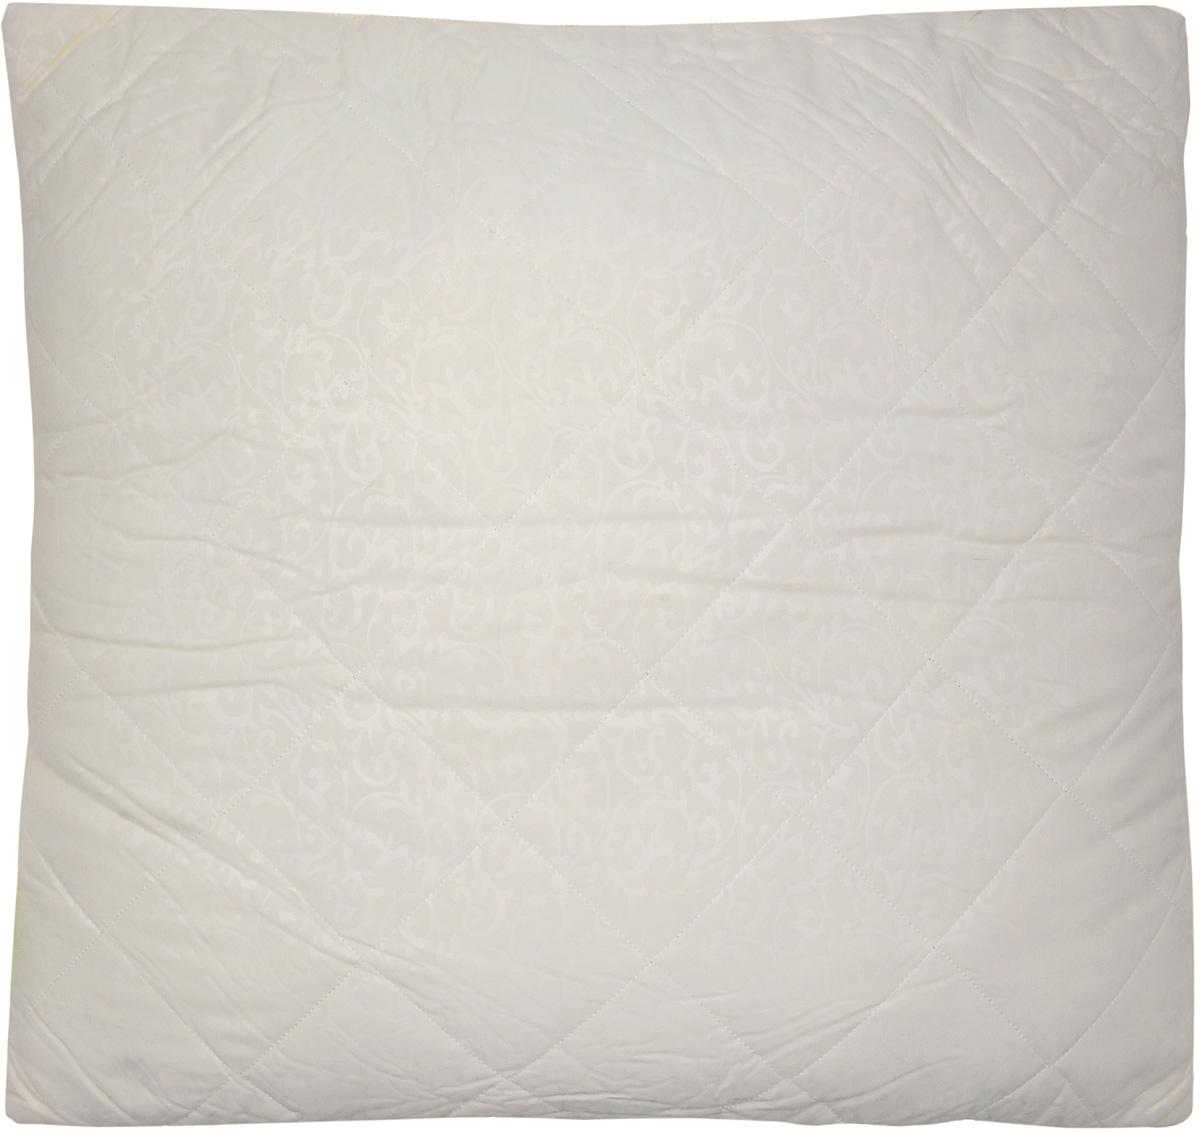 Подушка Miotex Овечья шерсть, наполнитель: овечья шерсть, цвет: бежевый, 68 х 68 см одеяло стеганое летнее miotex овечья шерсть 172 см х 205 см